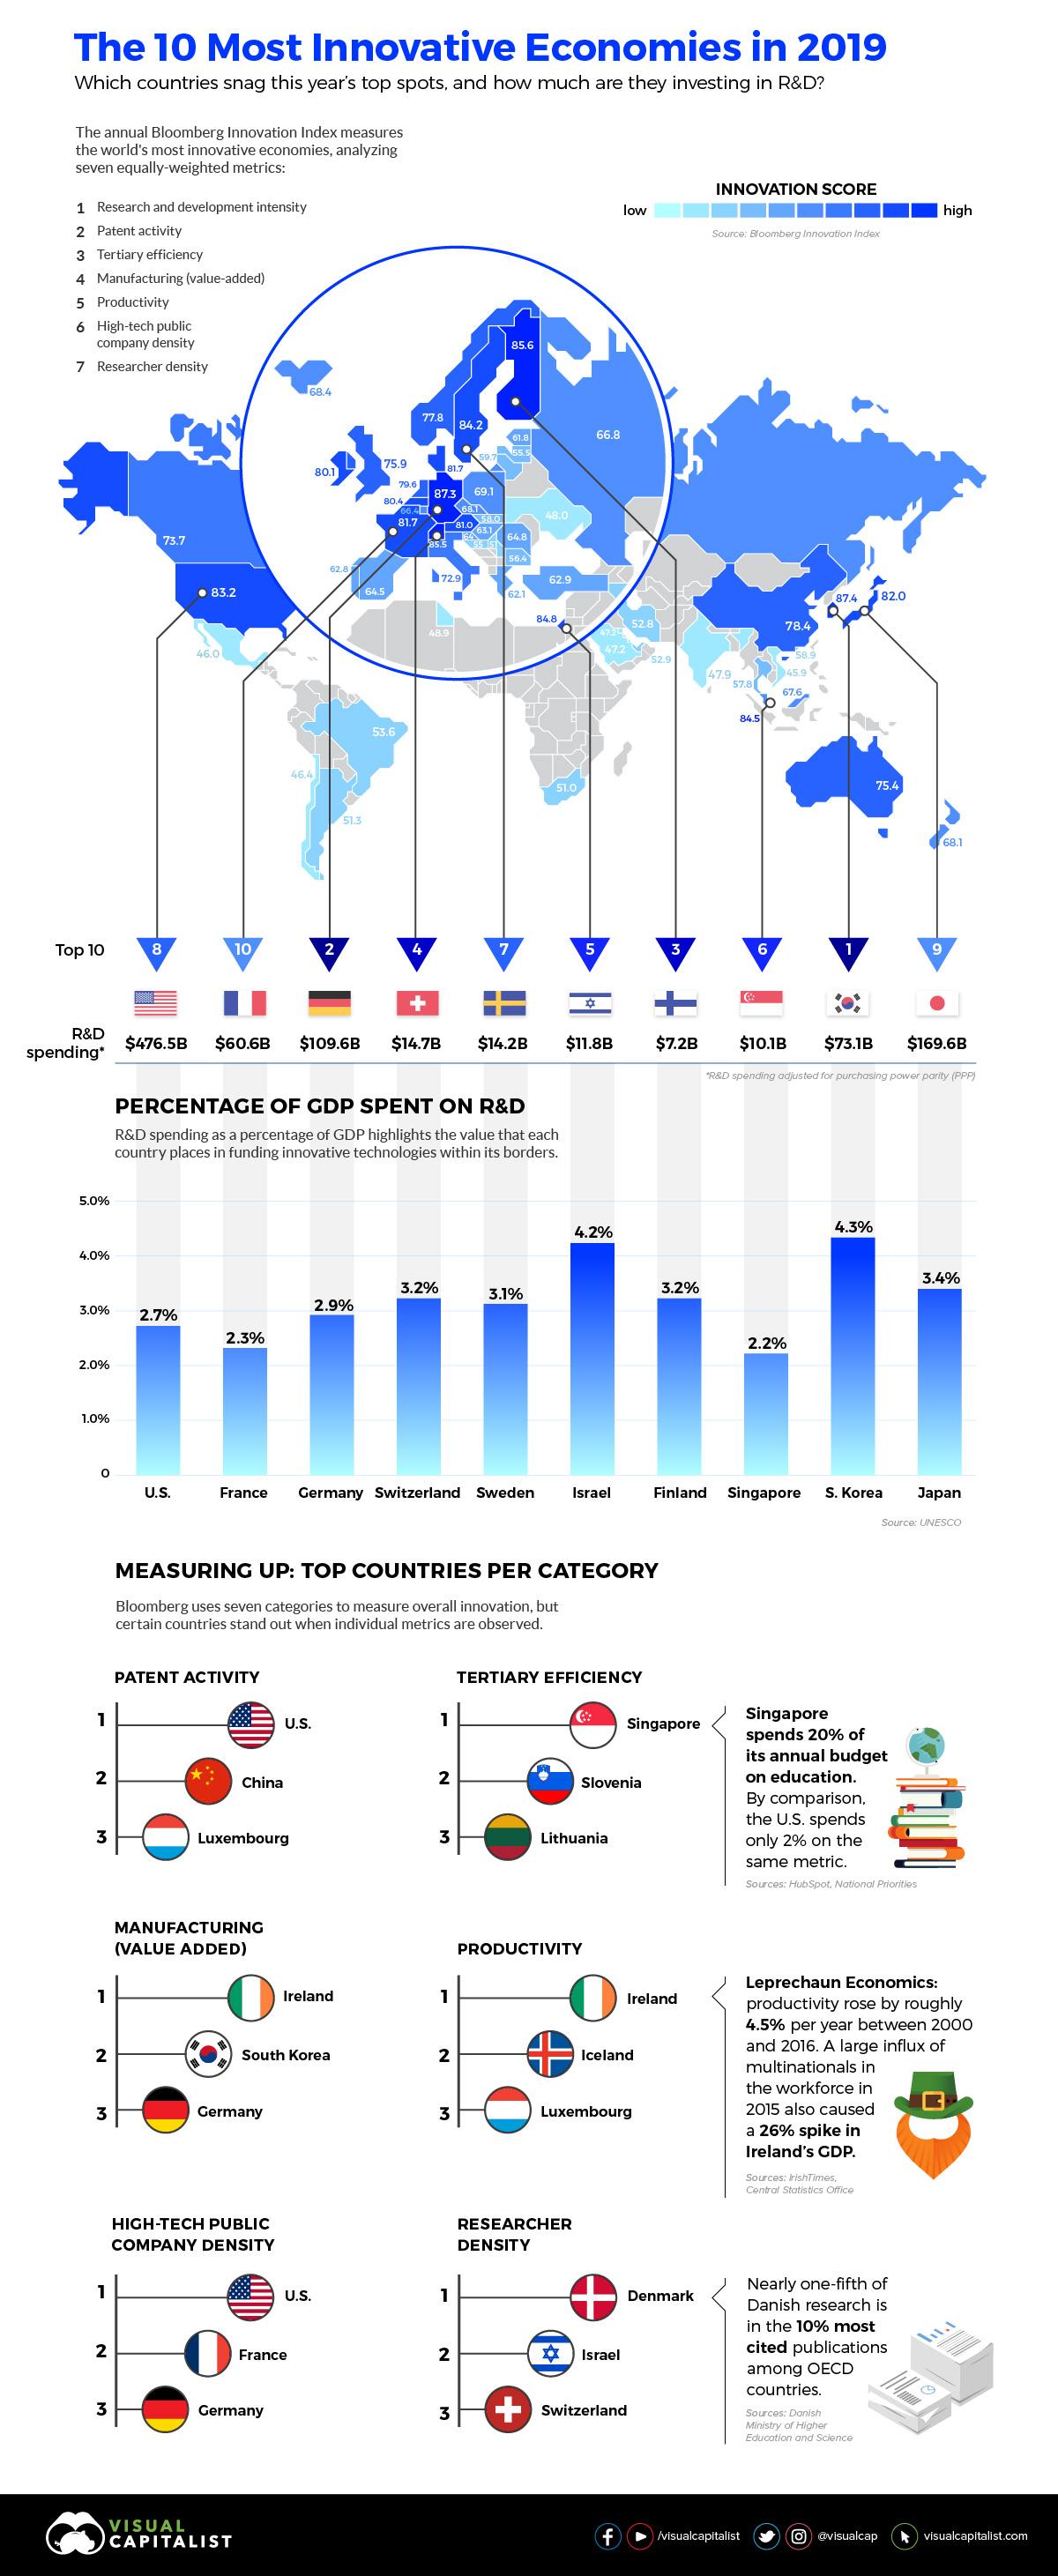 10 nejinovativnejsich ekonomik sveta v roce 2019